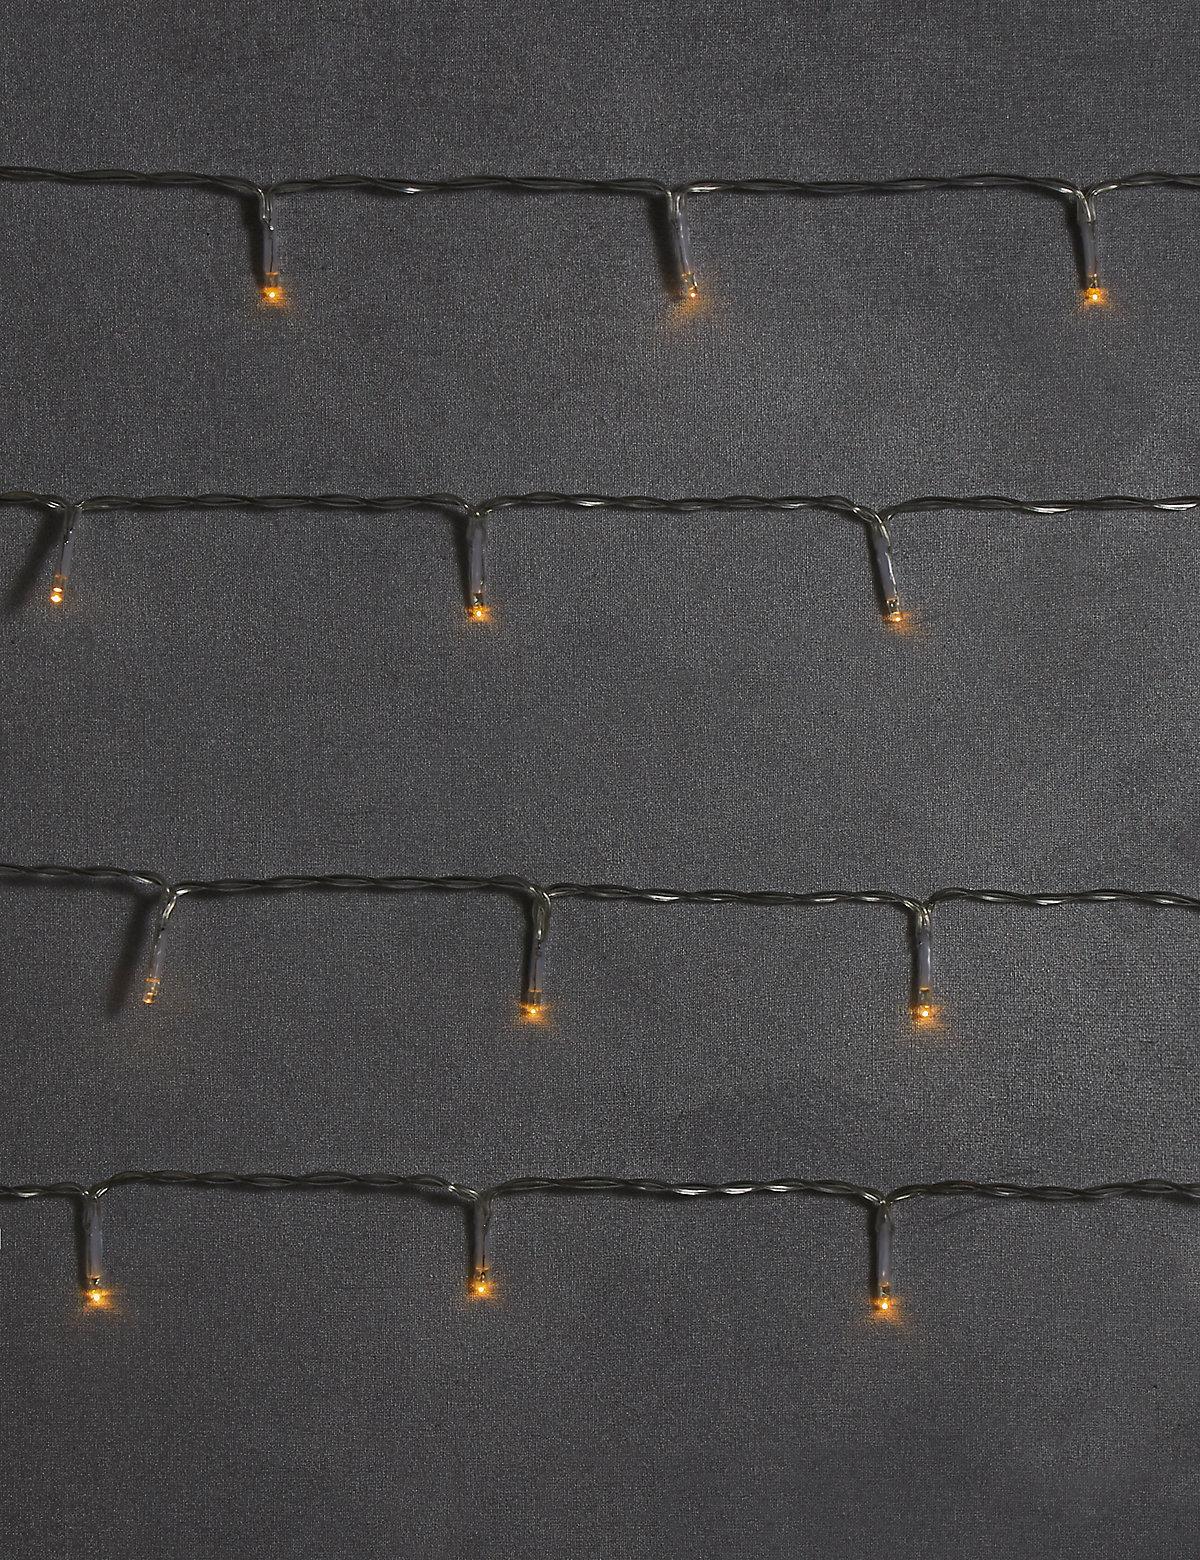 Image of 100 Warm White String Lights